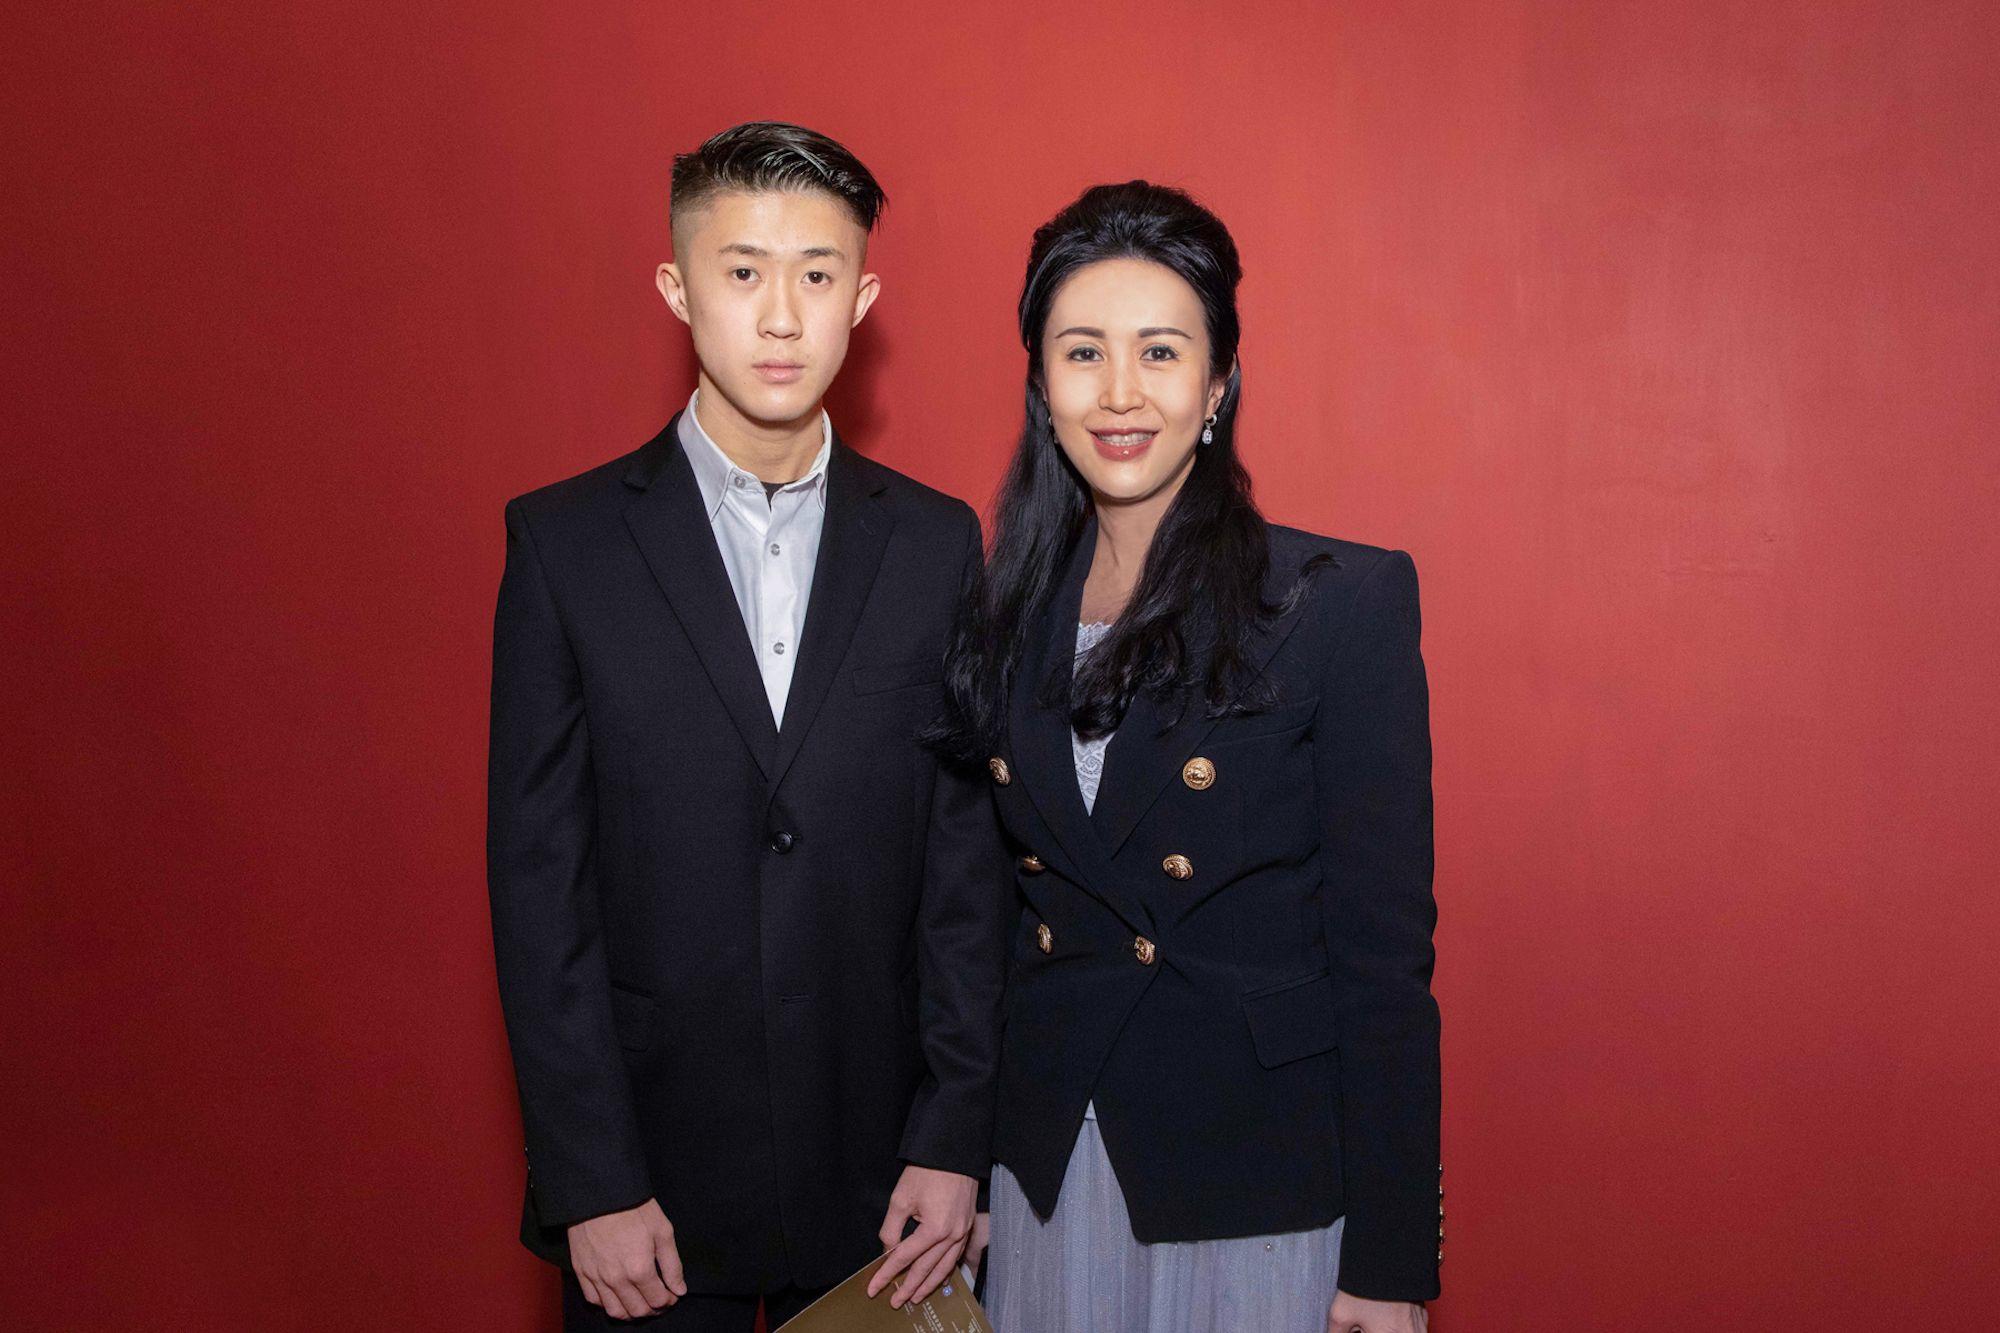 Edward Lam, Lianne Lam